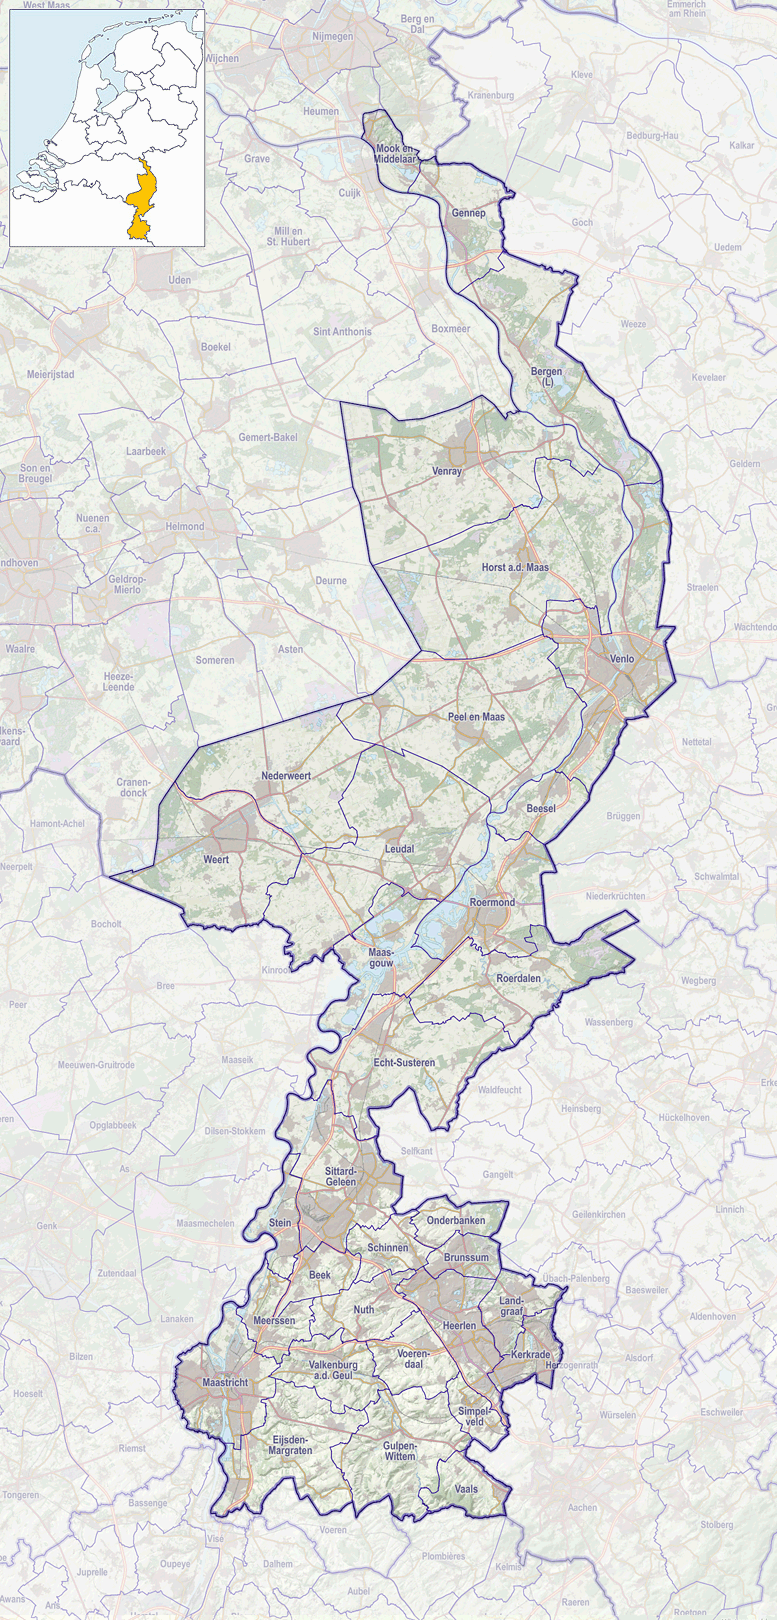 Spiksplinternieuw Milsbeek - Wikipedia YW-49